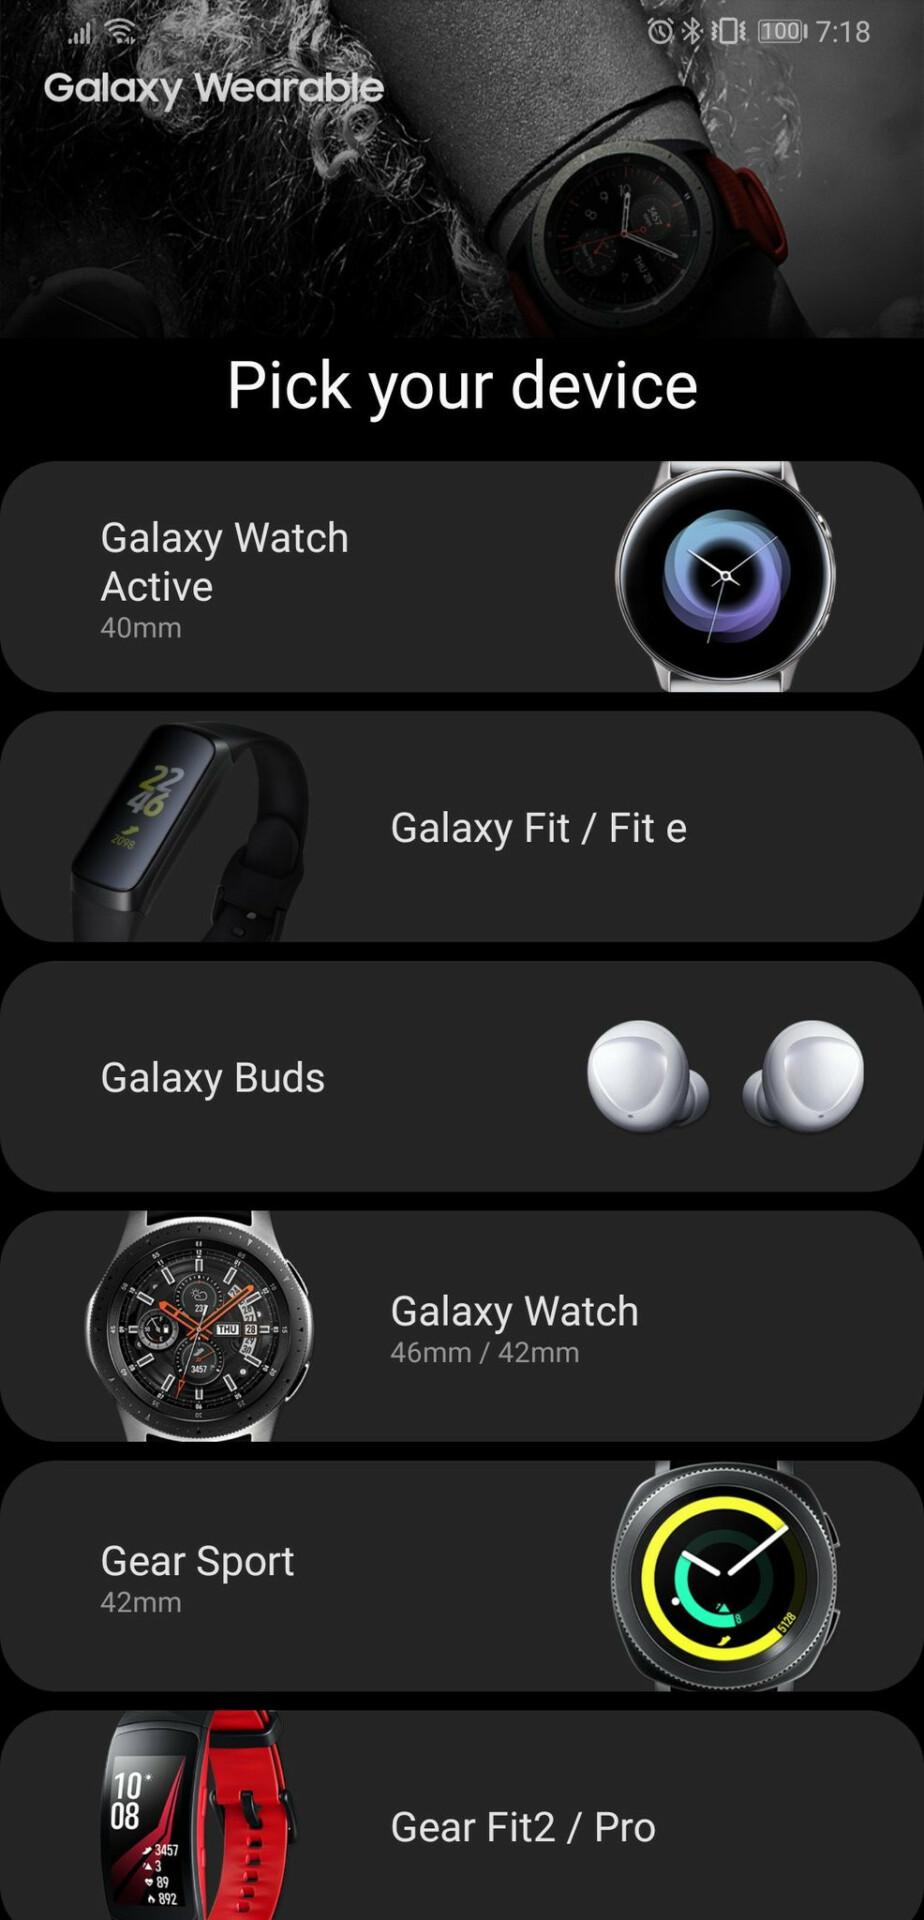 Galaxy Wearable